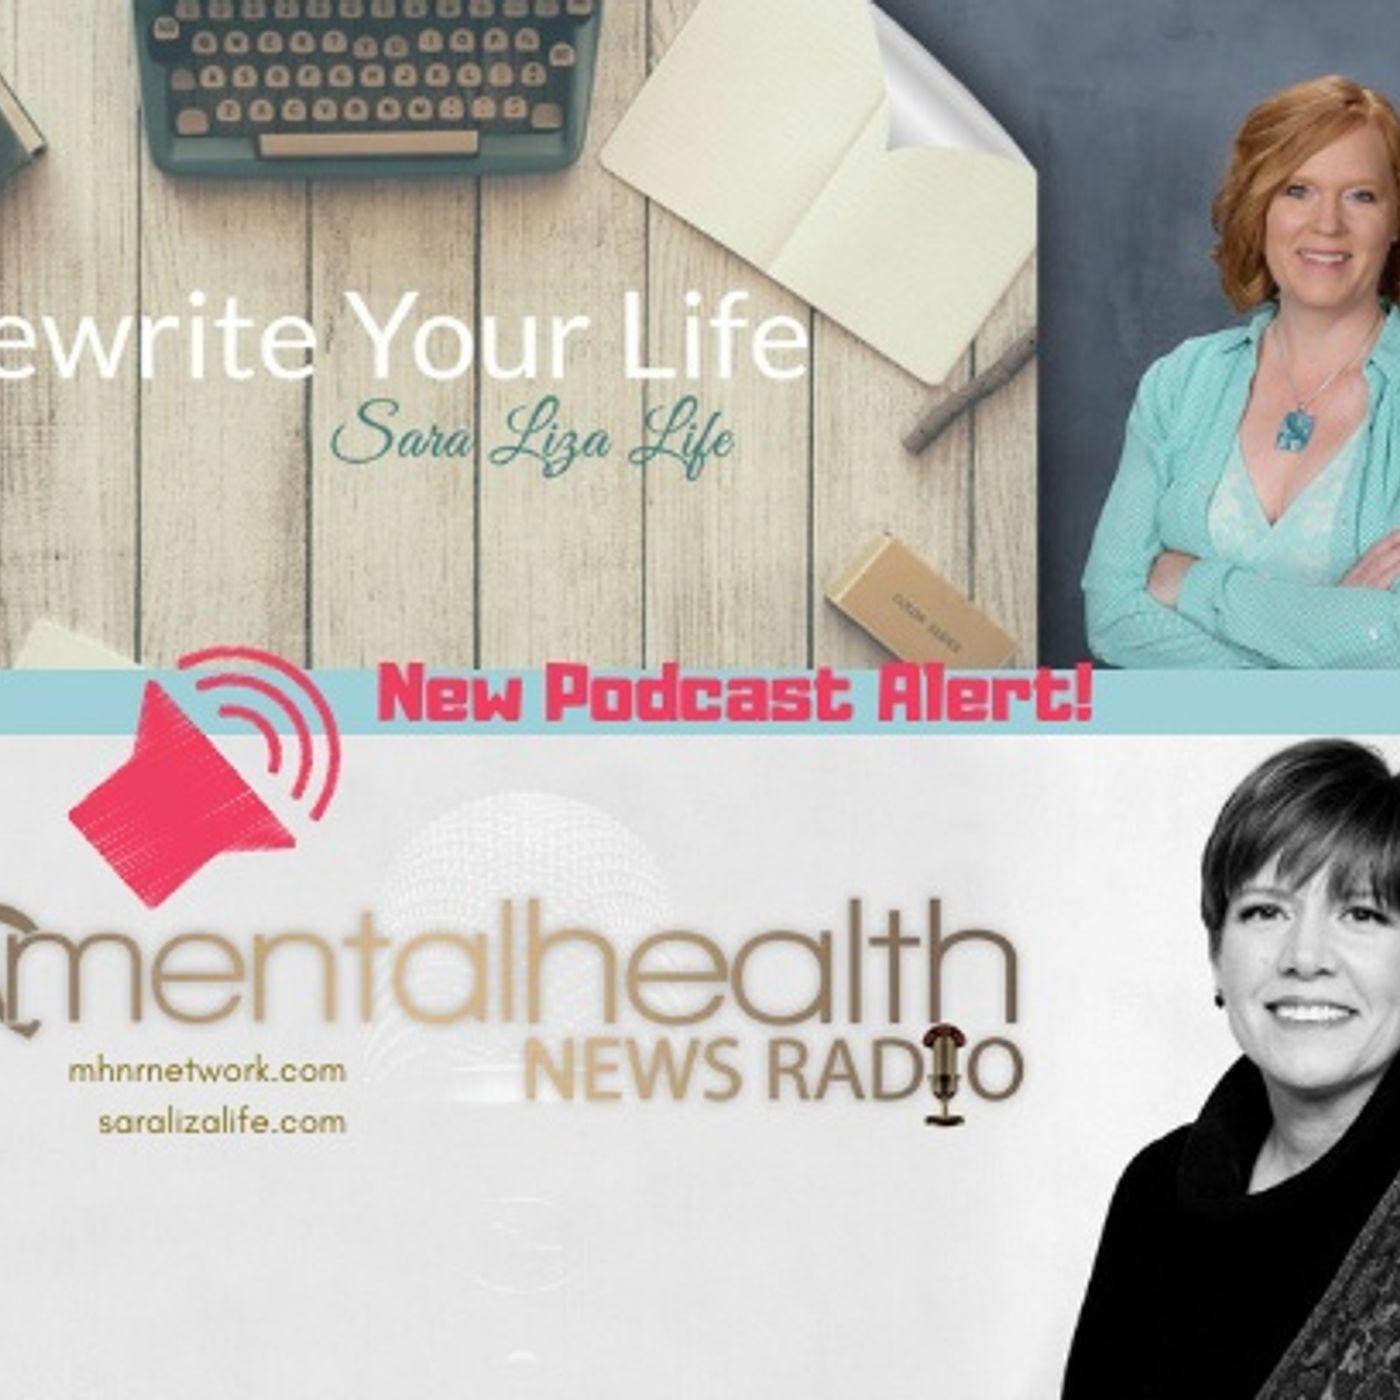 Mental Health News Radio - Rewrite Your Life!